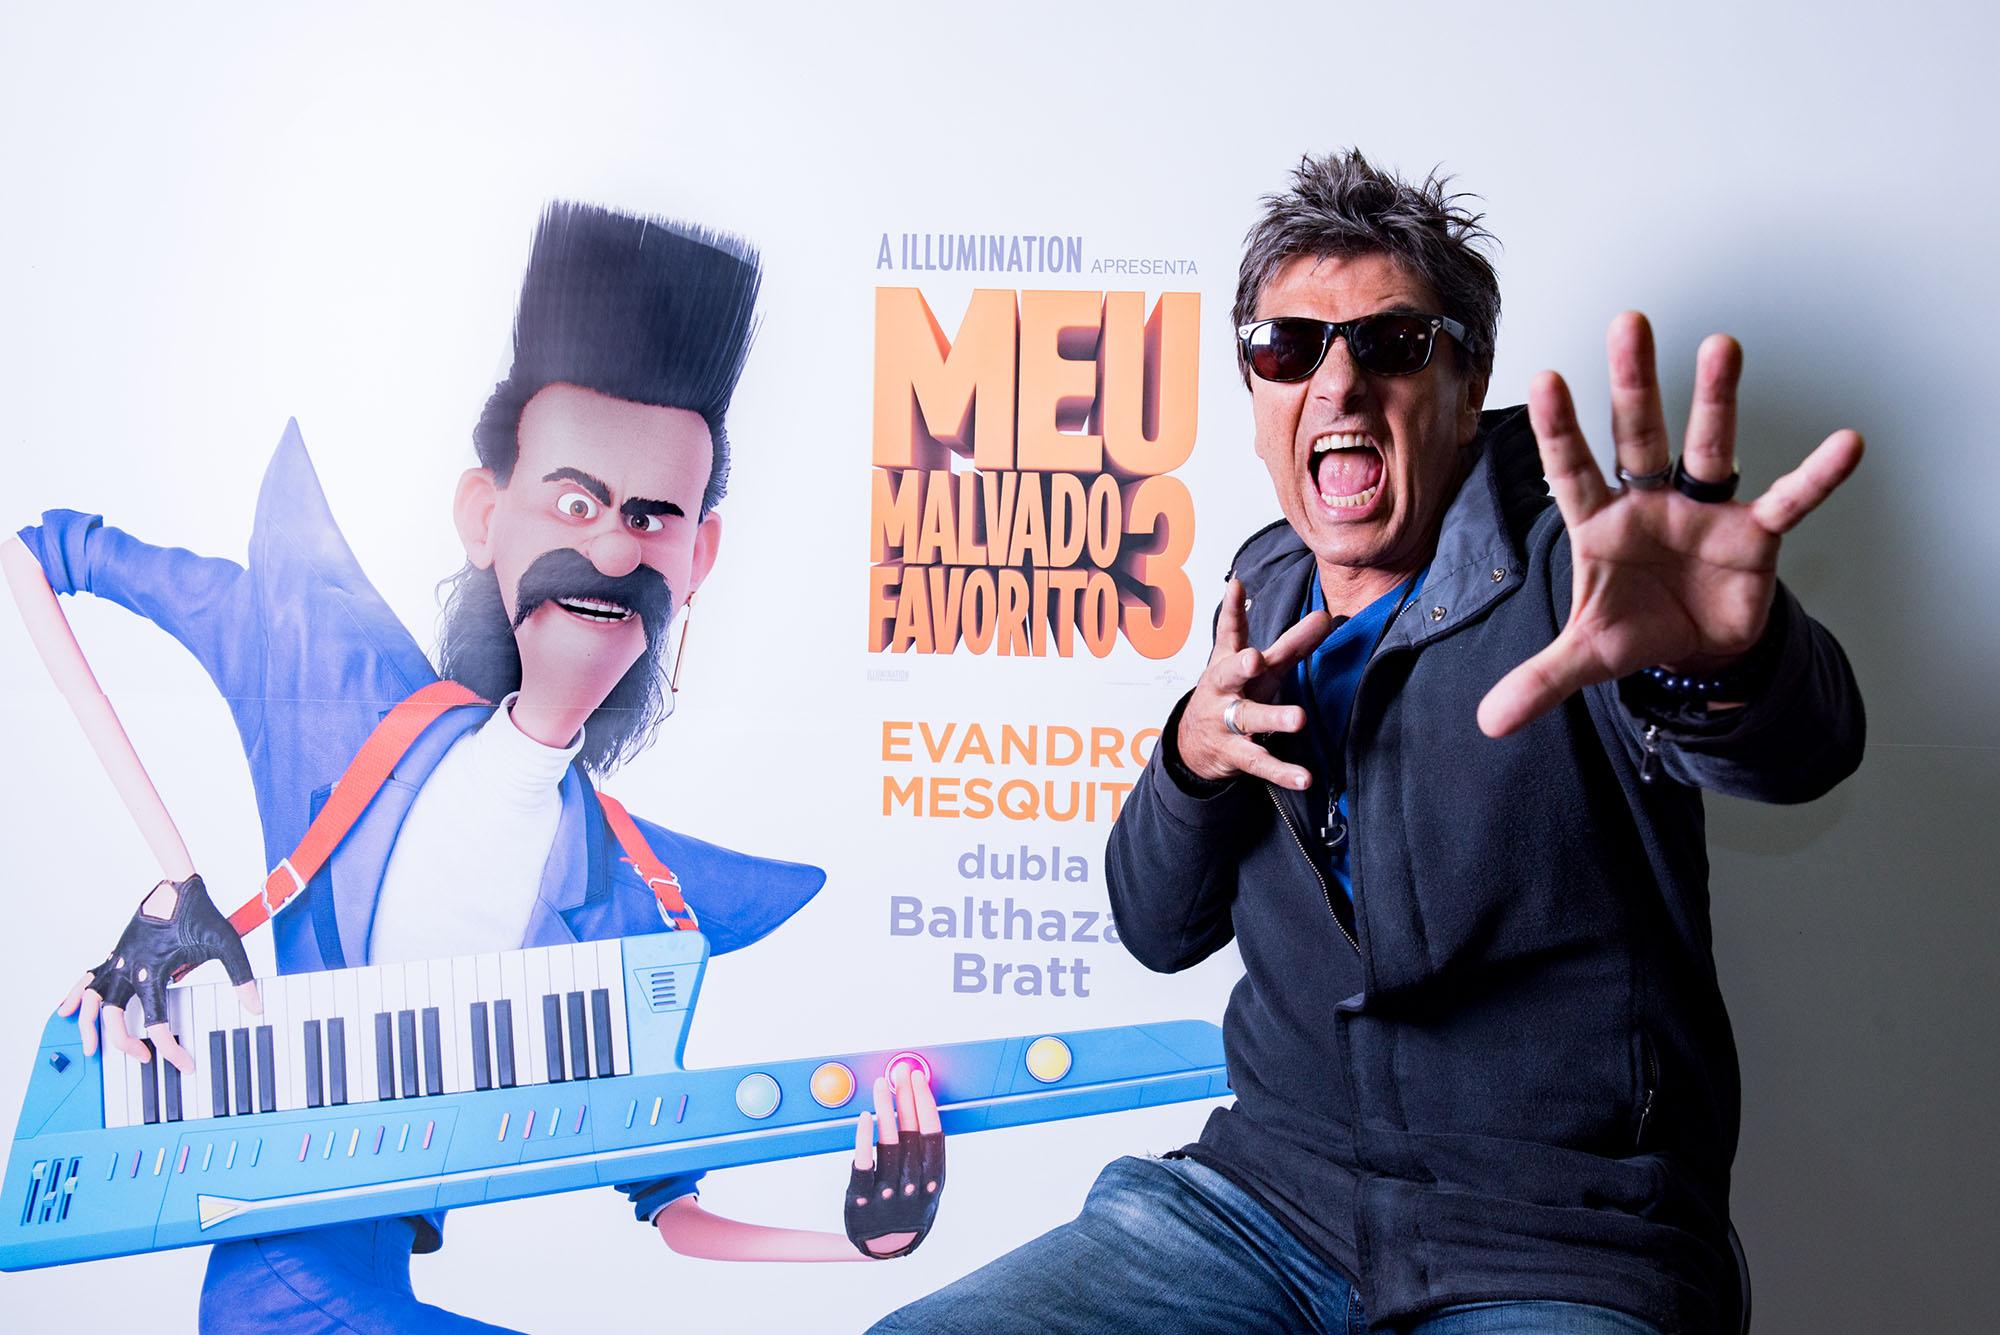 MeuMalvadoFavorito3_EvandroMesquita_03